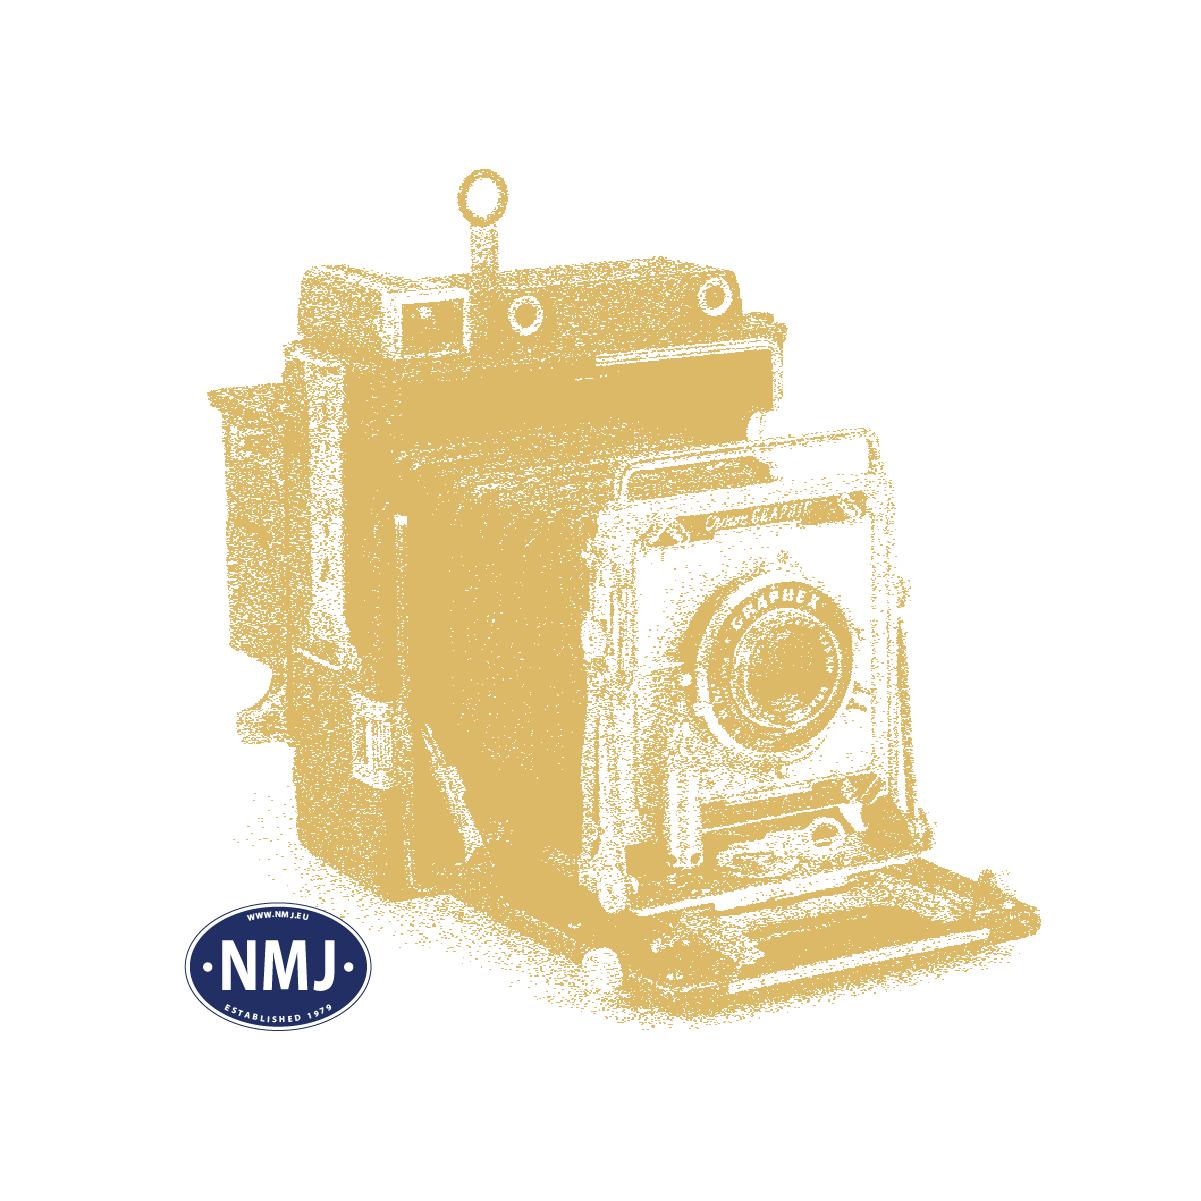 NMJT94011 - NMJ Topline Innlandsbanan Y1 1346, DCC w/ Sound